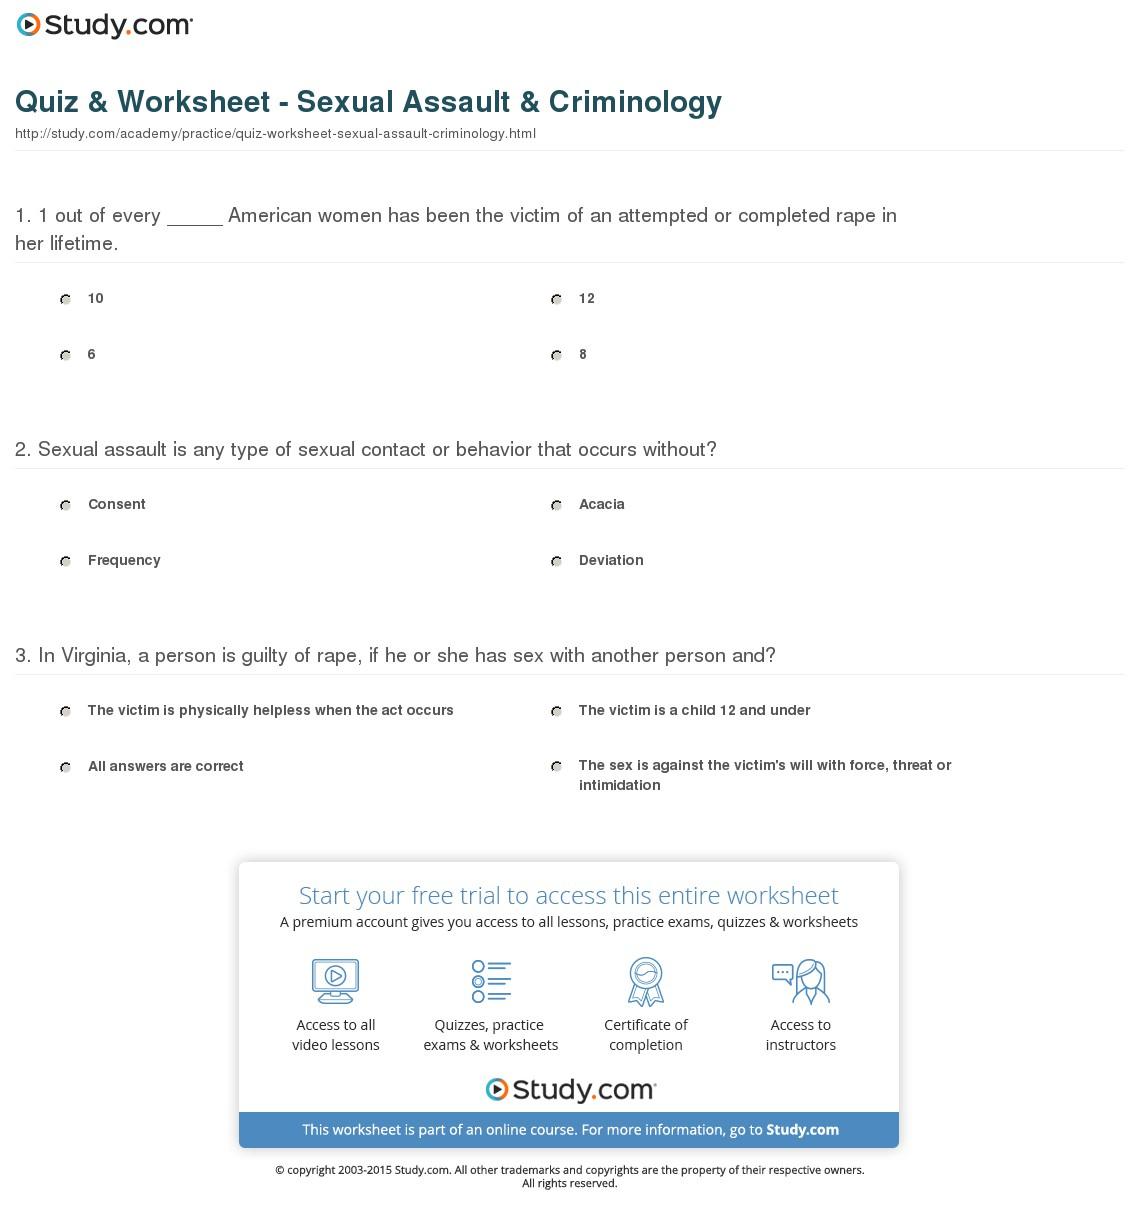 Quiz & Worksheet - Sexual Assault & Criminology | Study | Restorative Justice Printable Worksheets